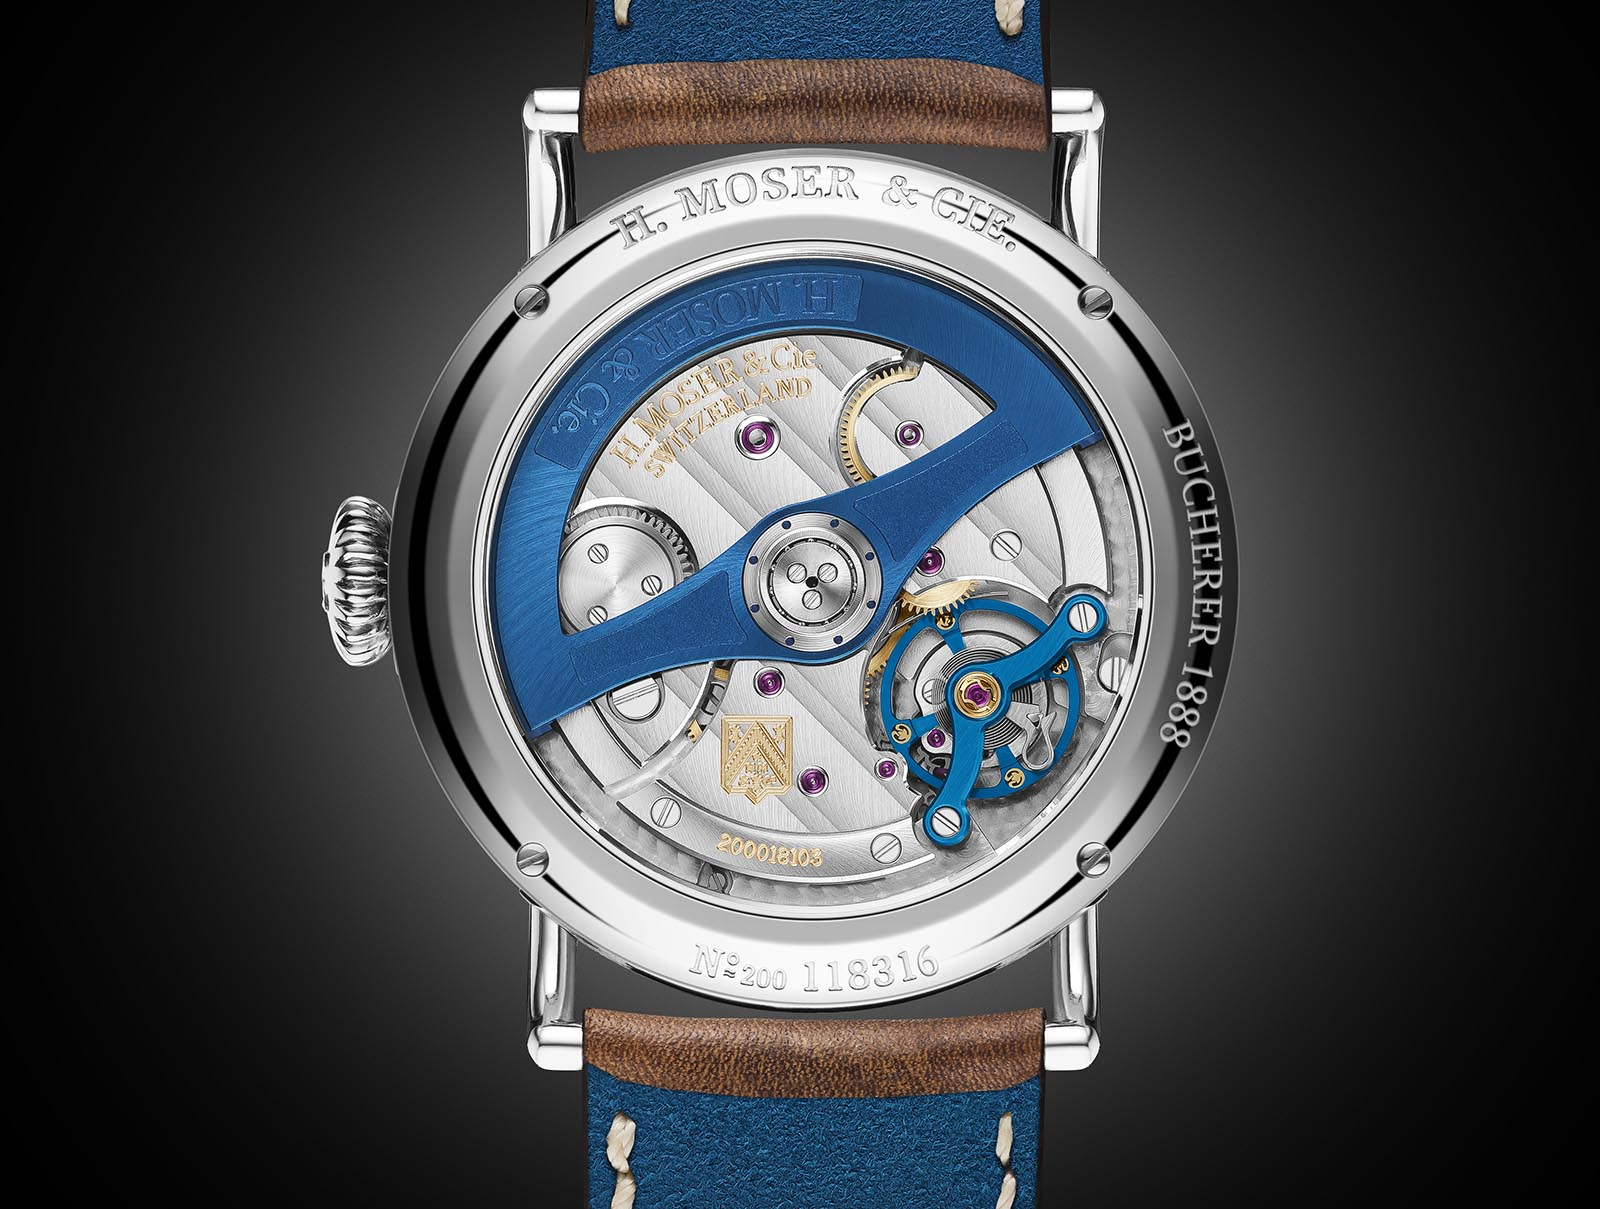 H. Moser & Cie. Heritage Bucherer Blue Edition 6